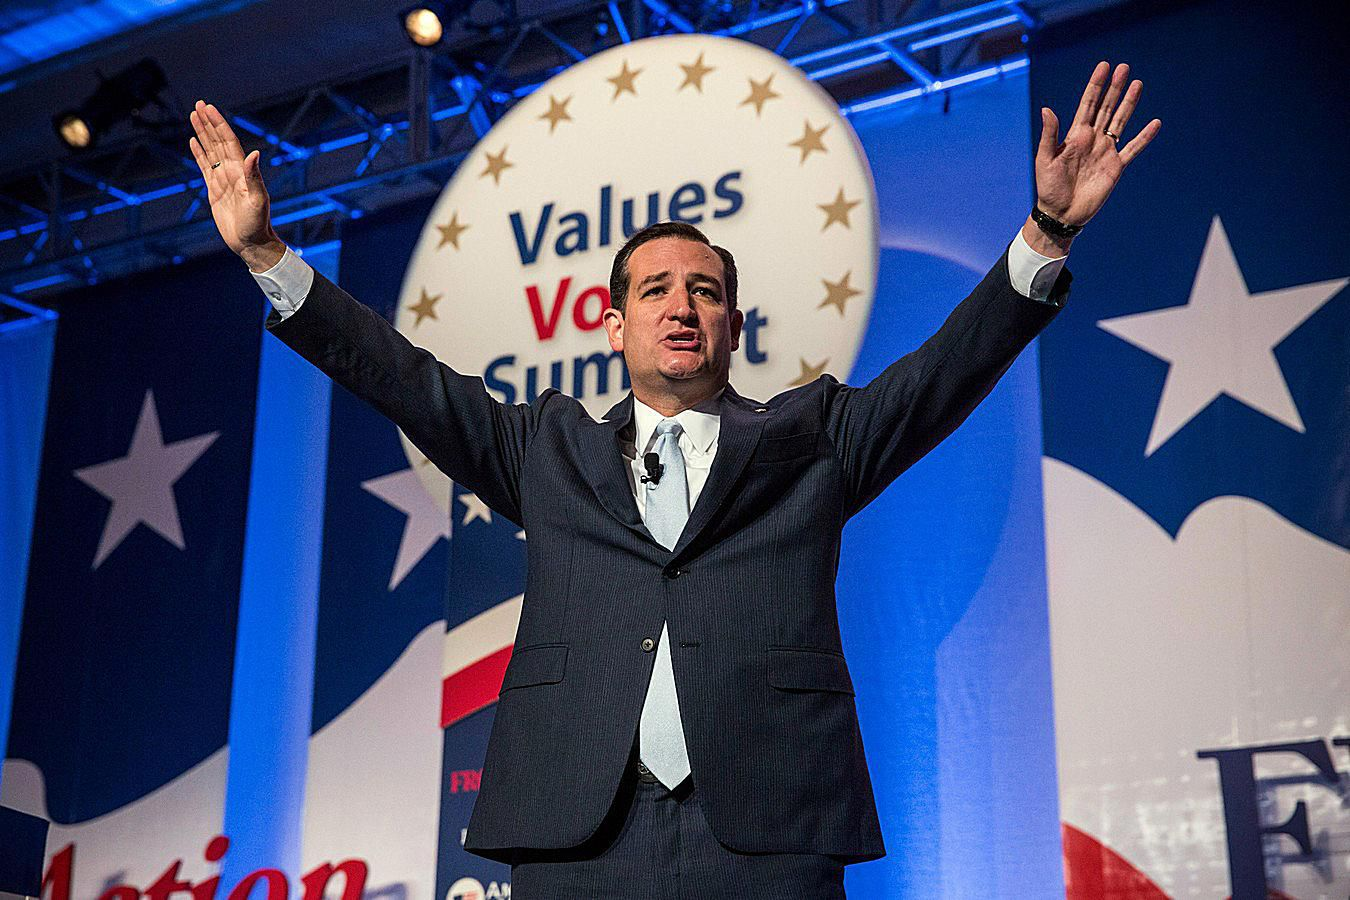 Born In Canada Can Ted Cruz Run For President